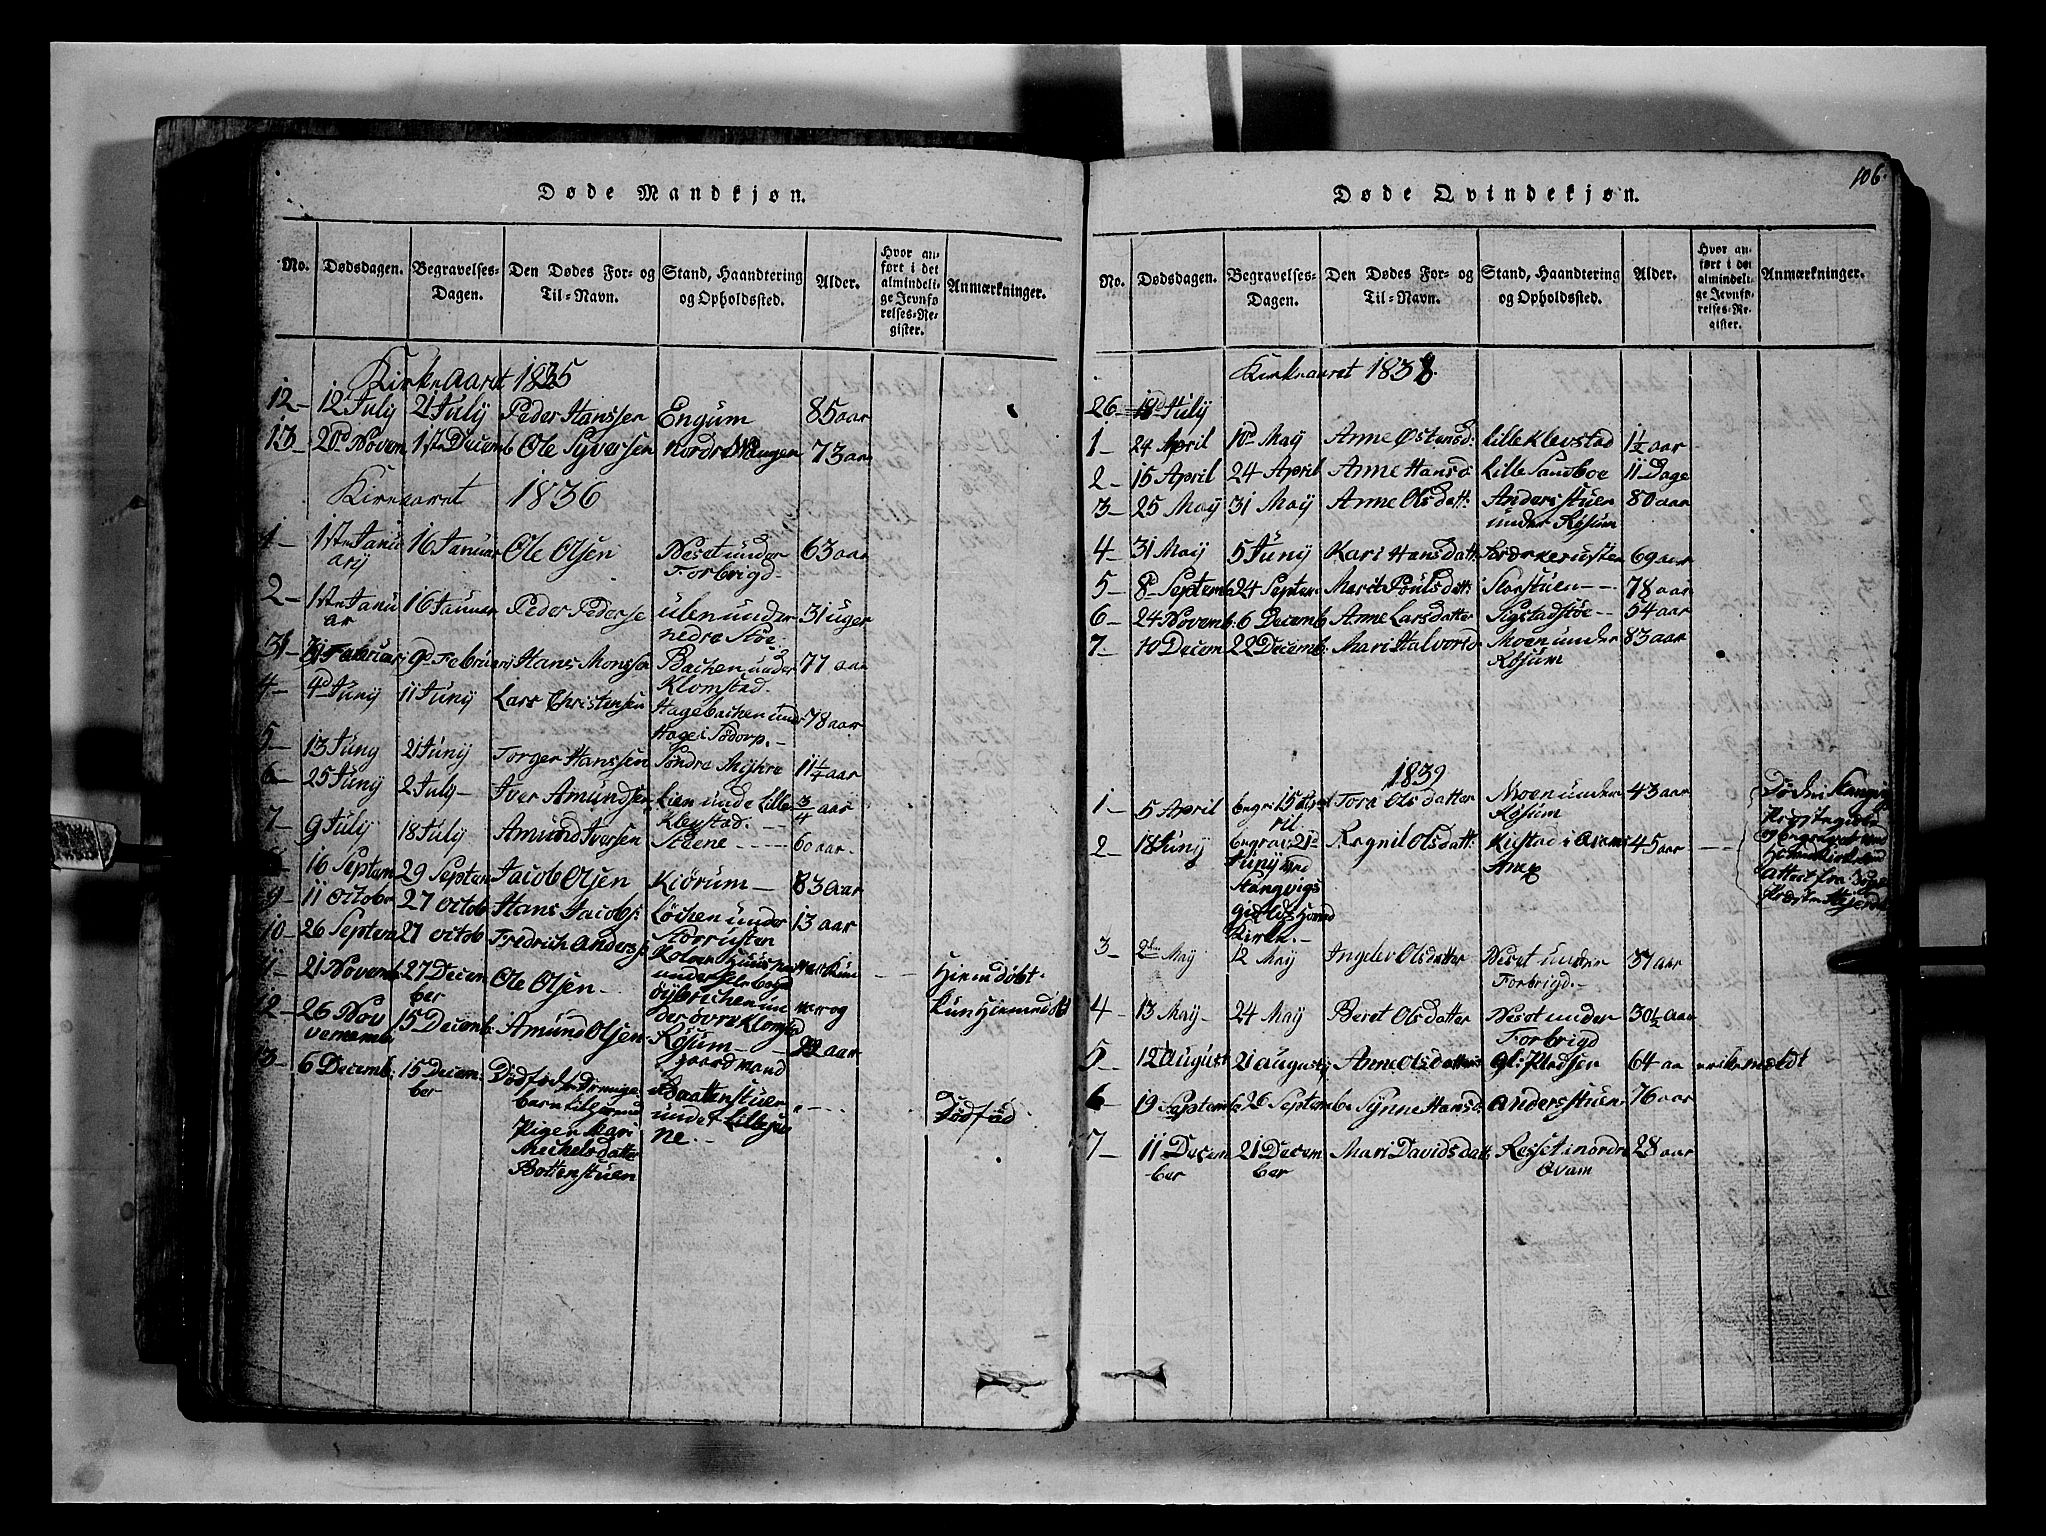 SAH, Fron prestekontor, H/Ha/Hab/L0002: Klokkerbok nr. 2, 1816-1850, s. 106